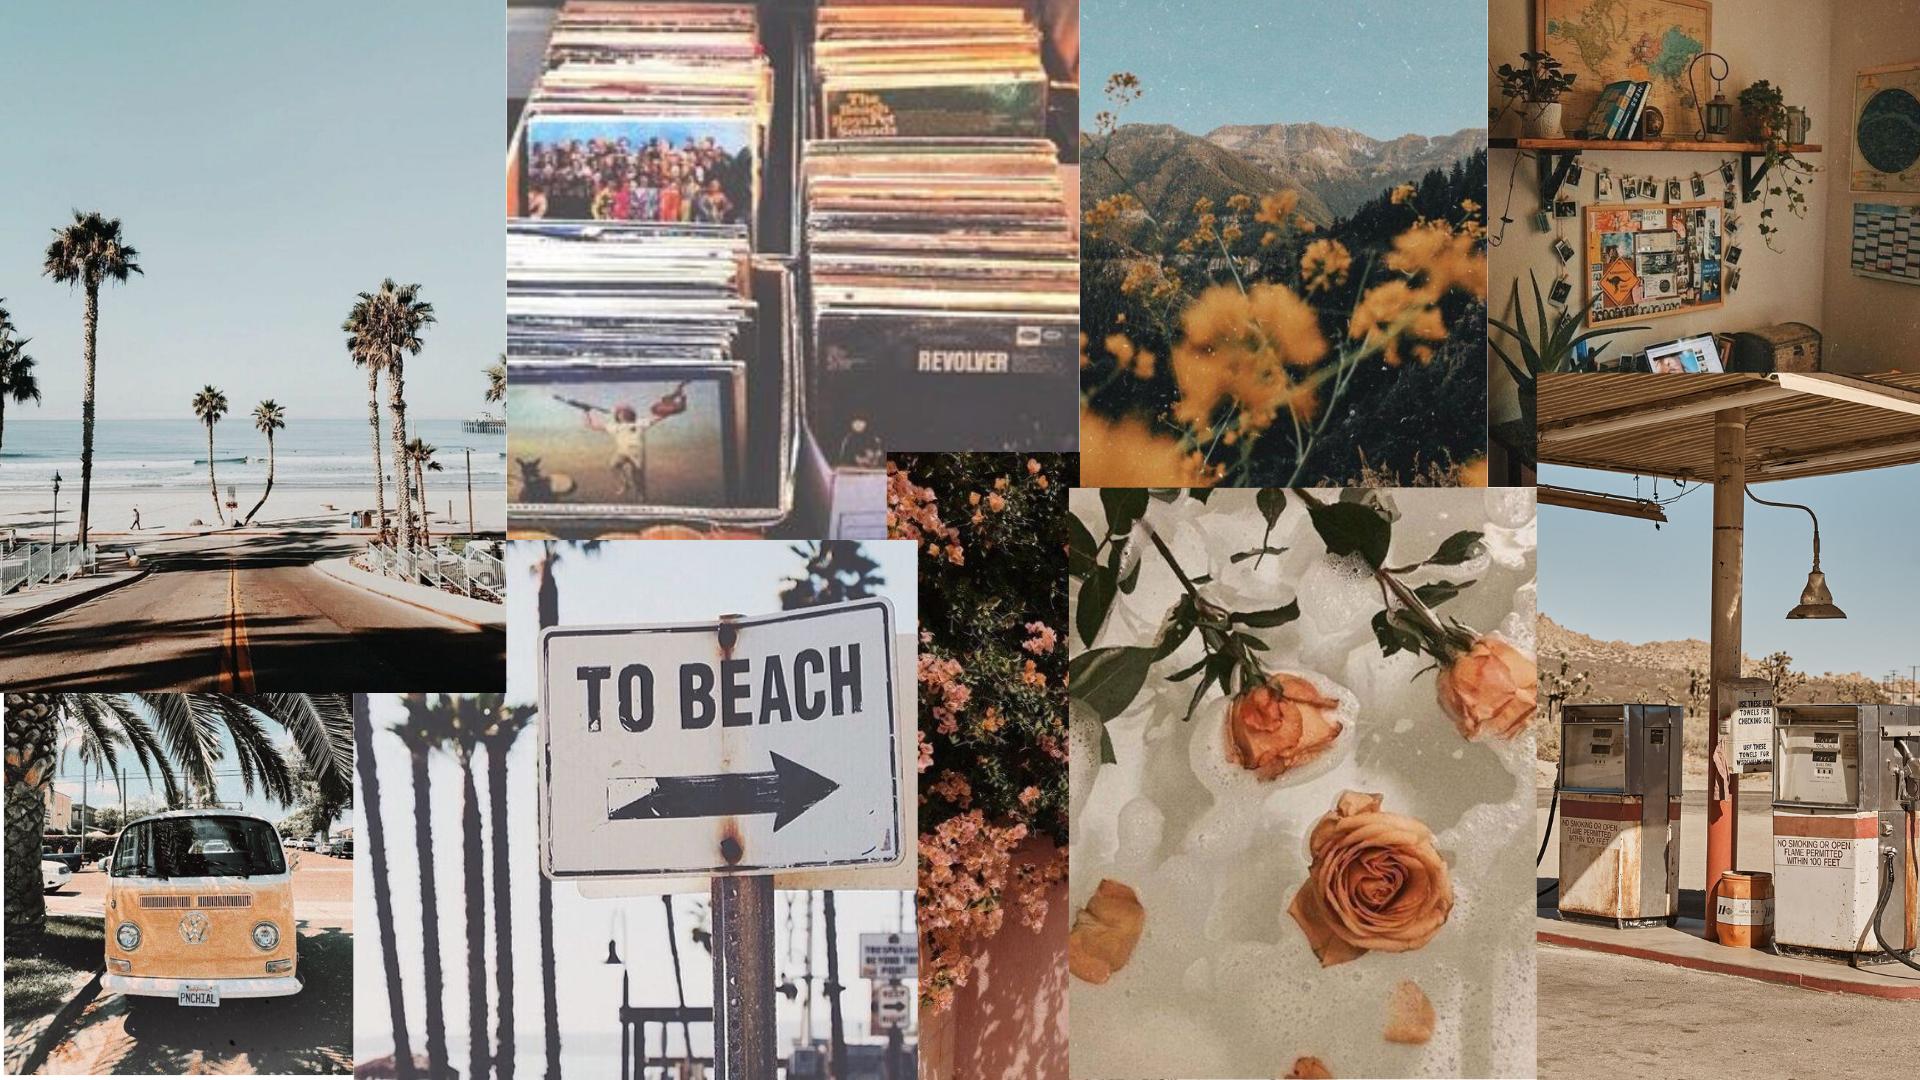 Aesthetic Desktop Background In 2020 Aesthetic Desktop Wallpaper Backgrounds Desktop Instagram Photo Frame